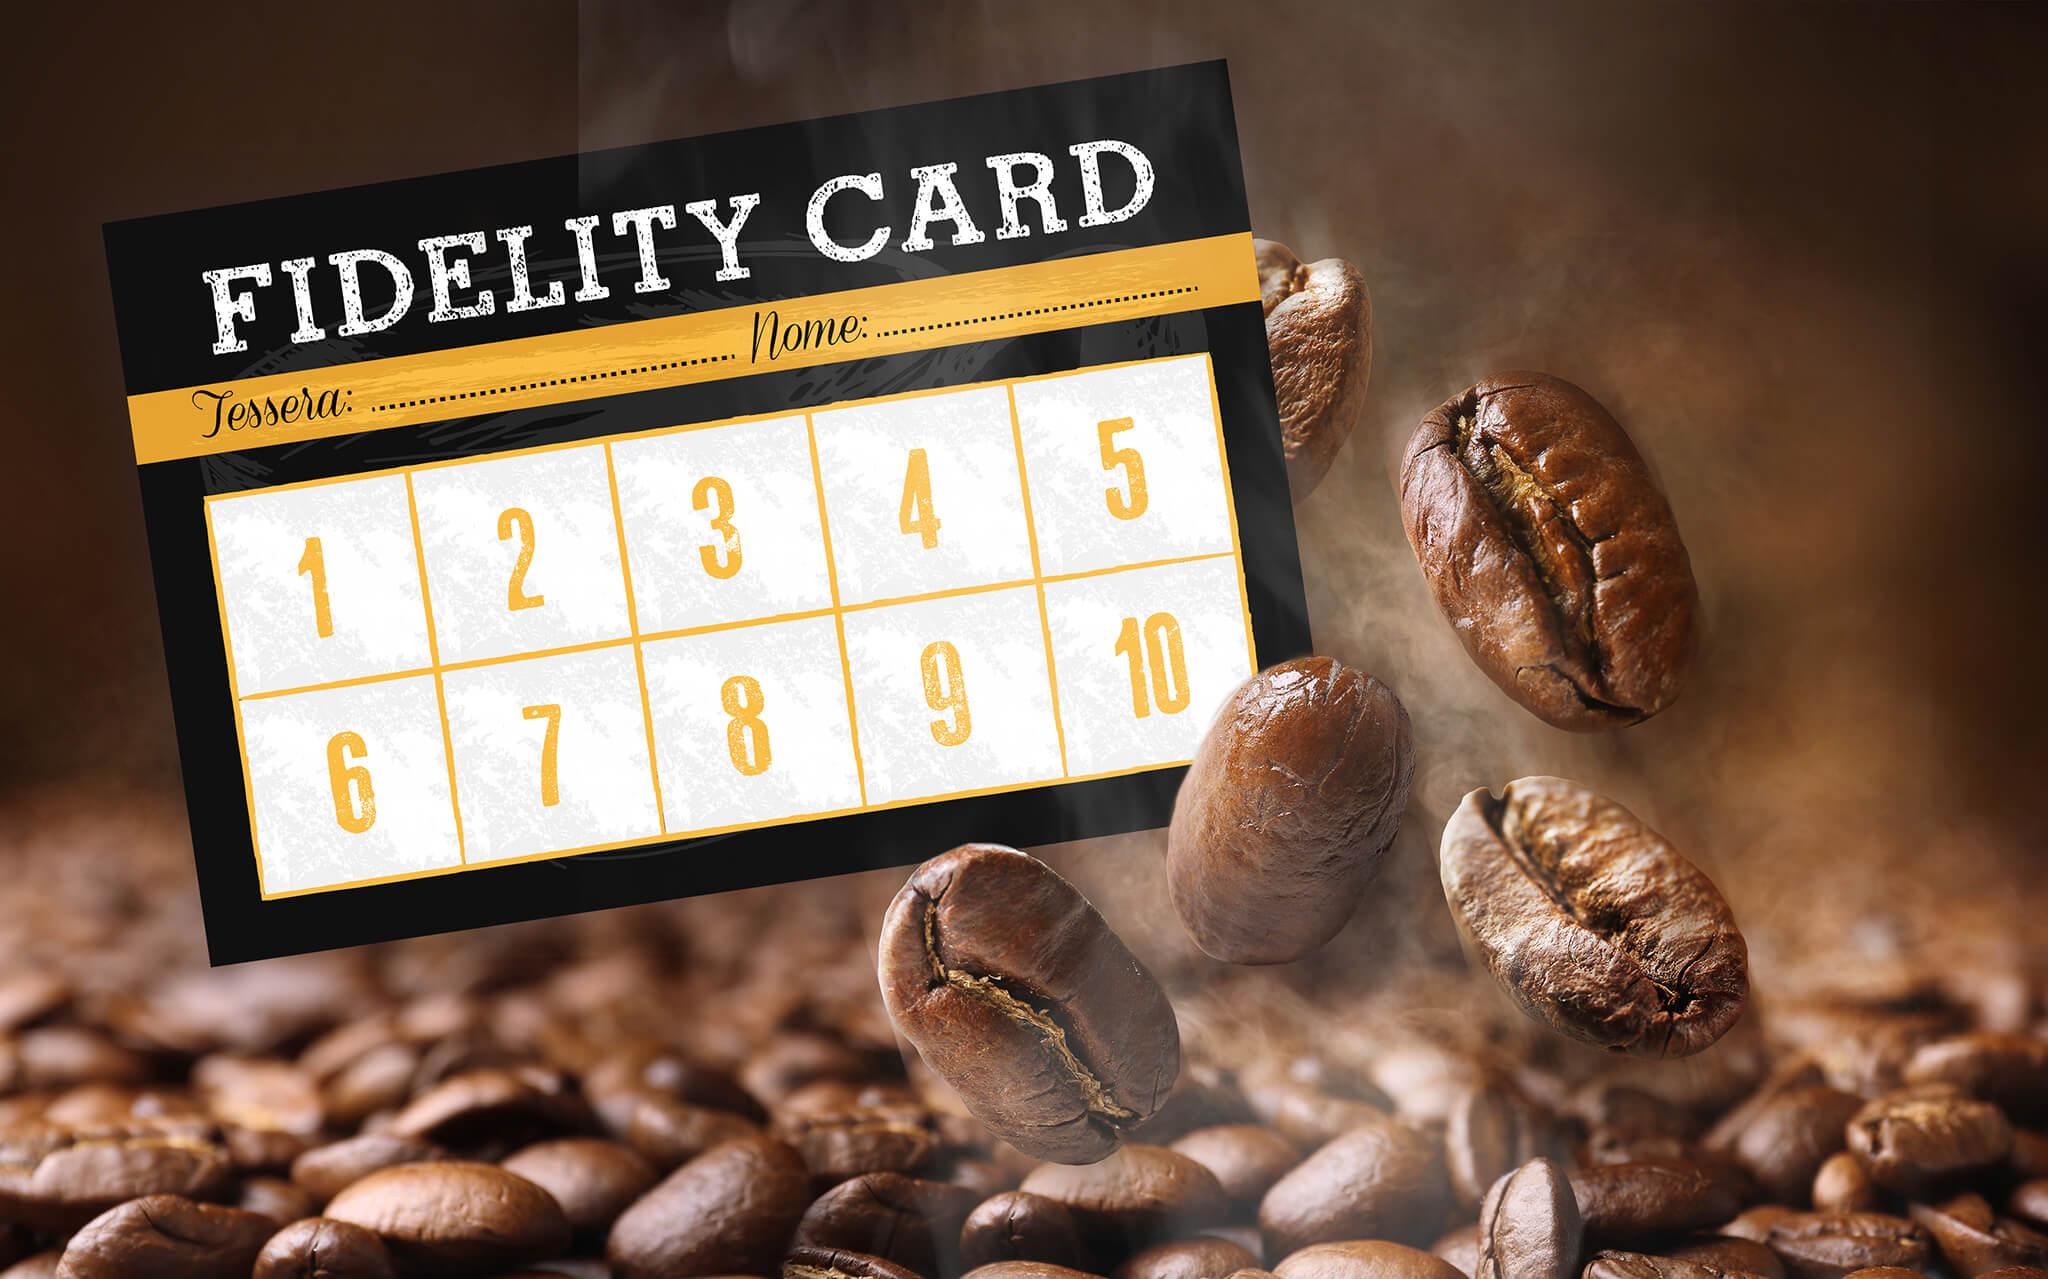 Caffeina - Fidelity Card